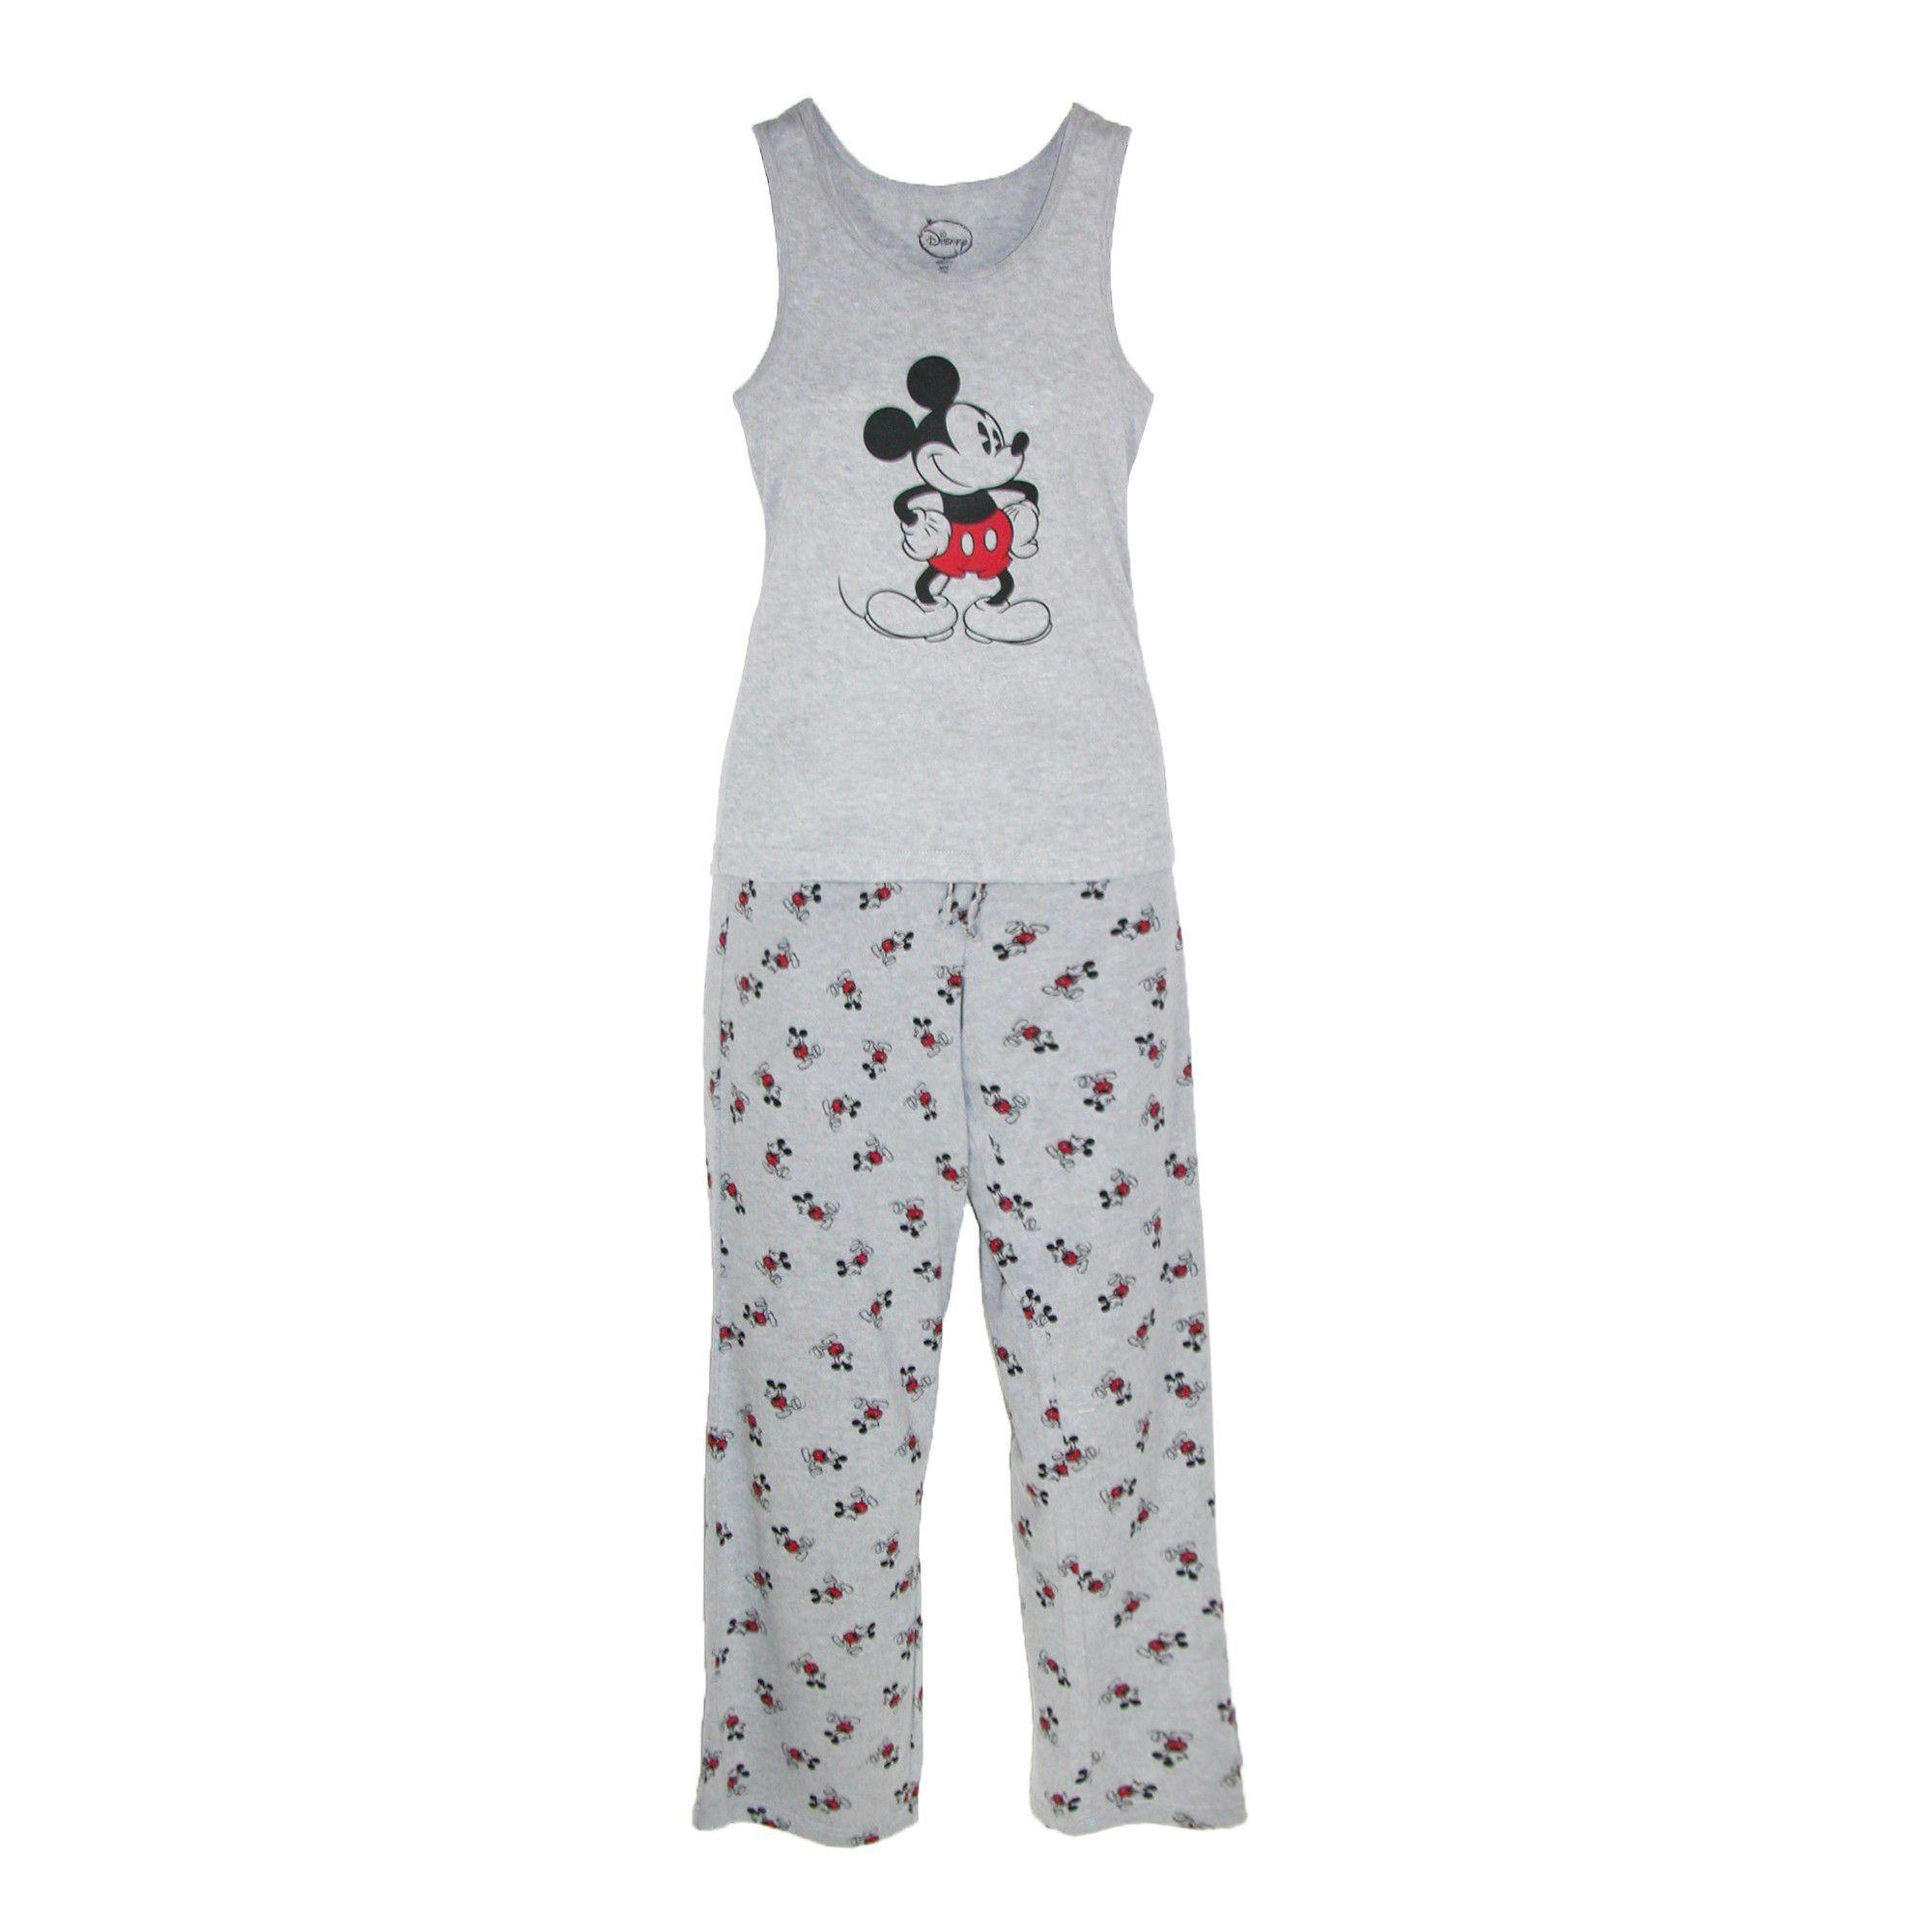 CTM Disney Mickey Mouse Womens Tank and Pant Pajama Set